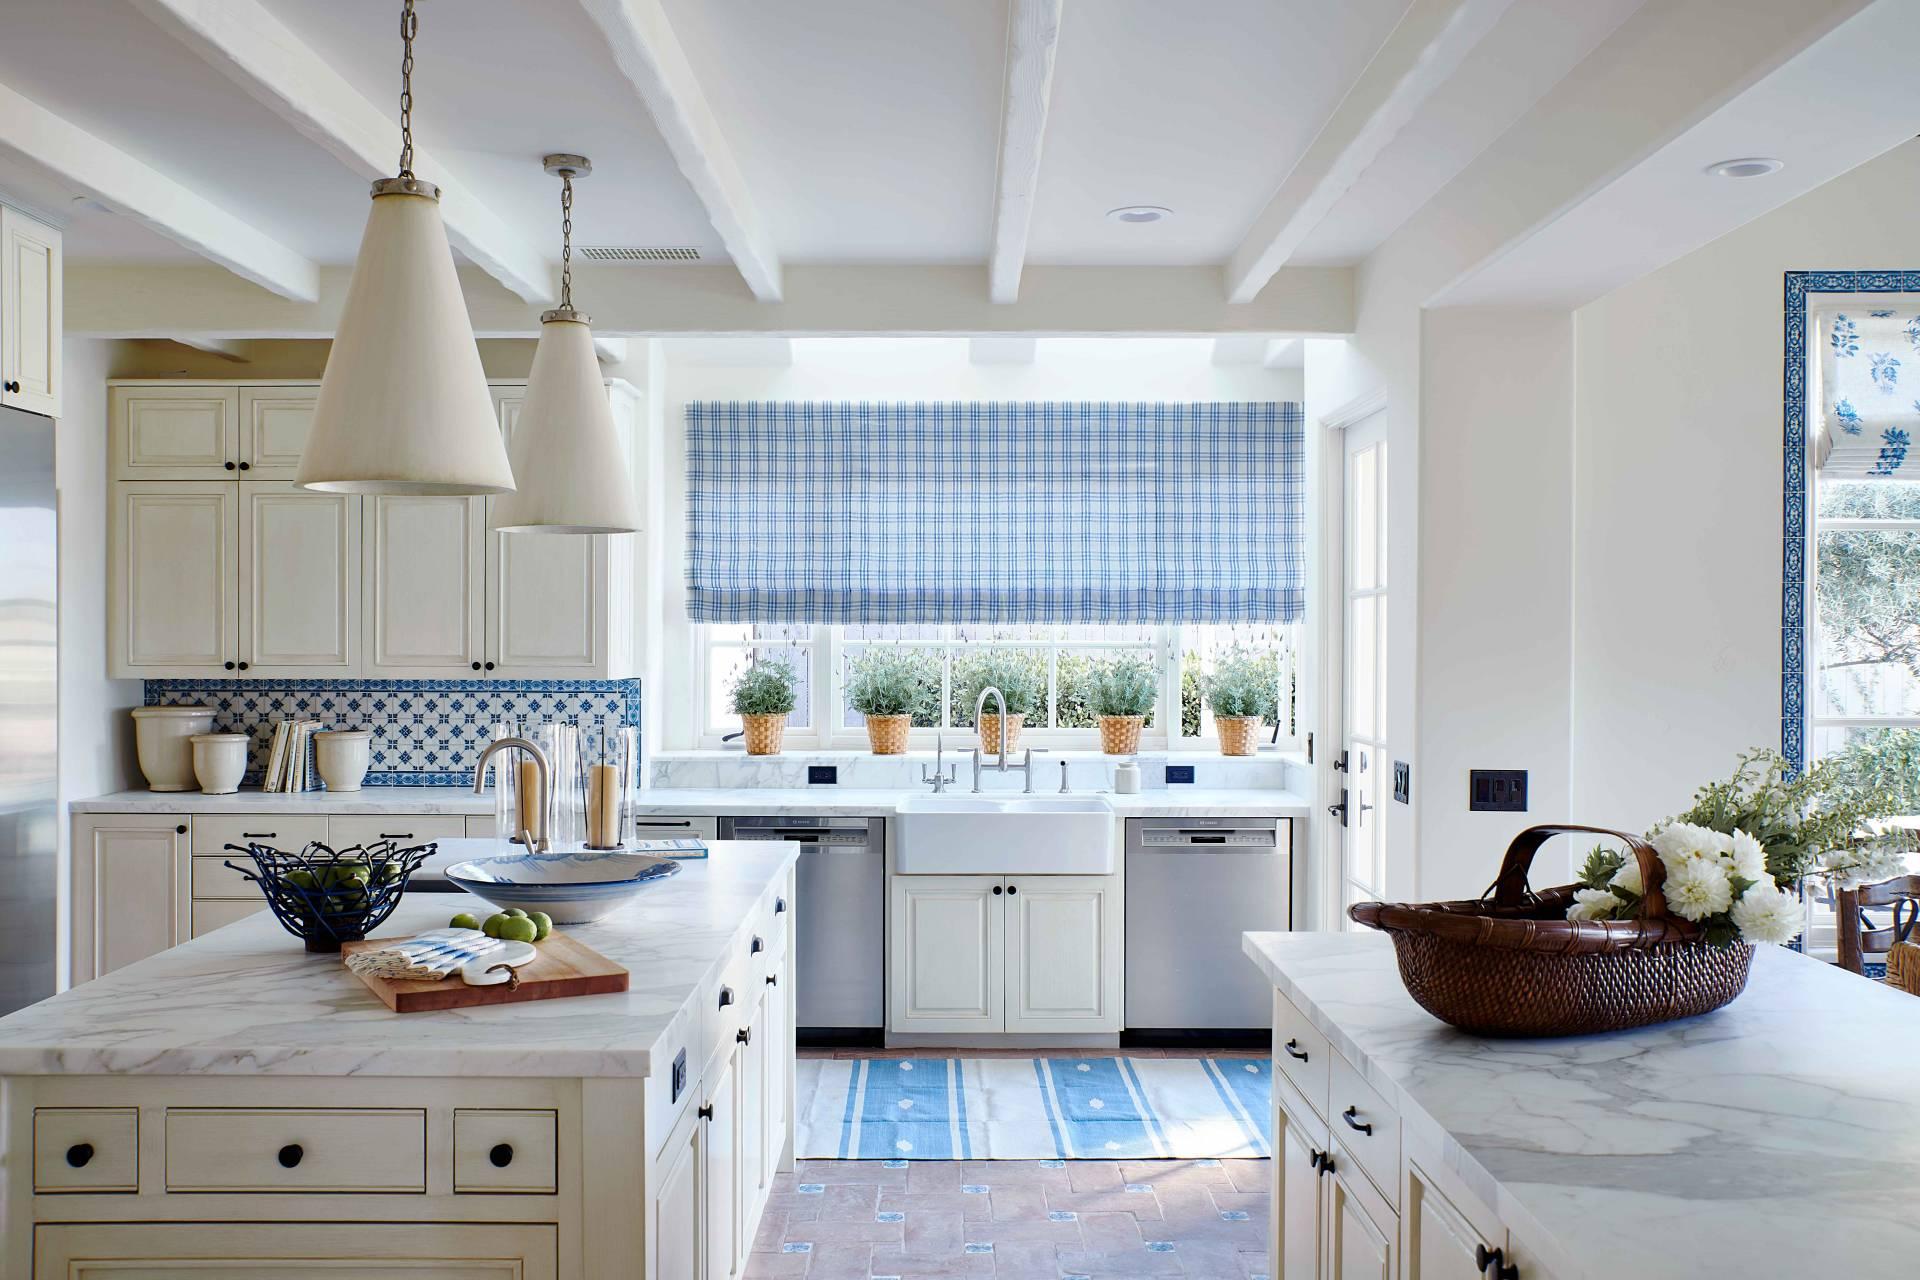 Kitchen Blue and White Checkered Roman Shade